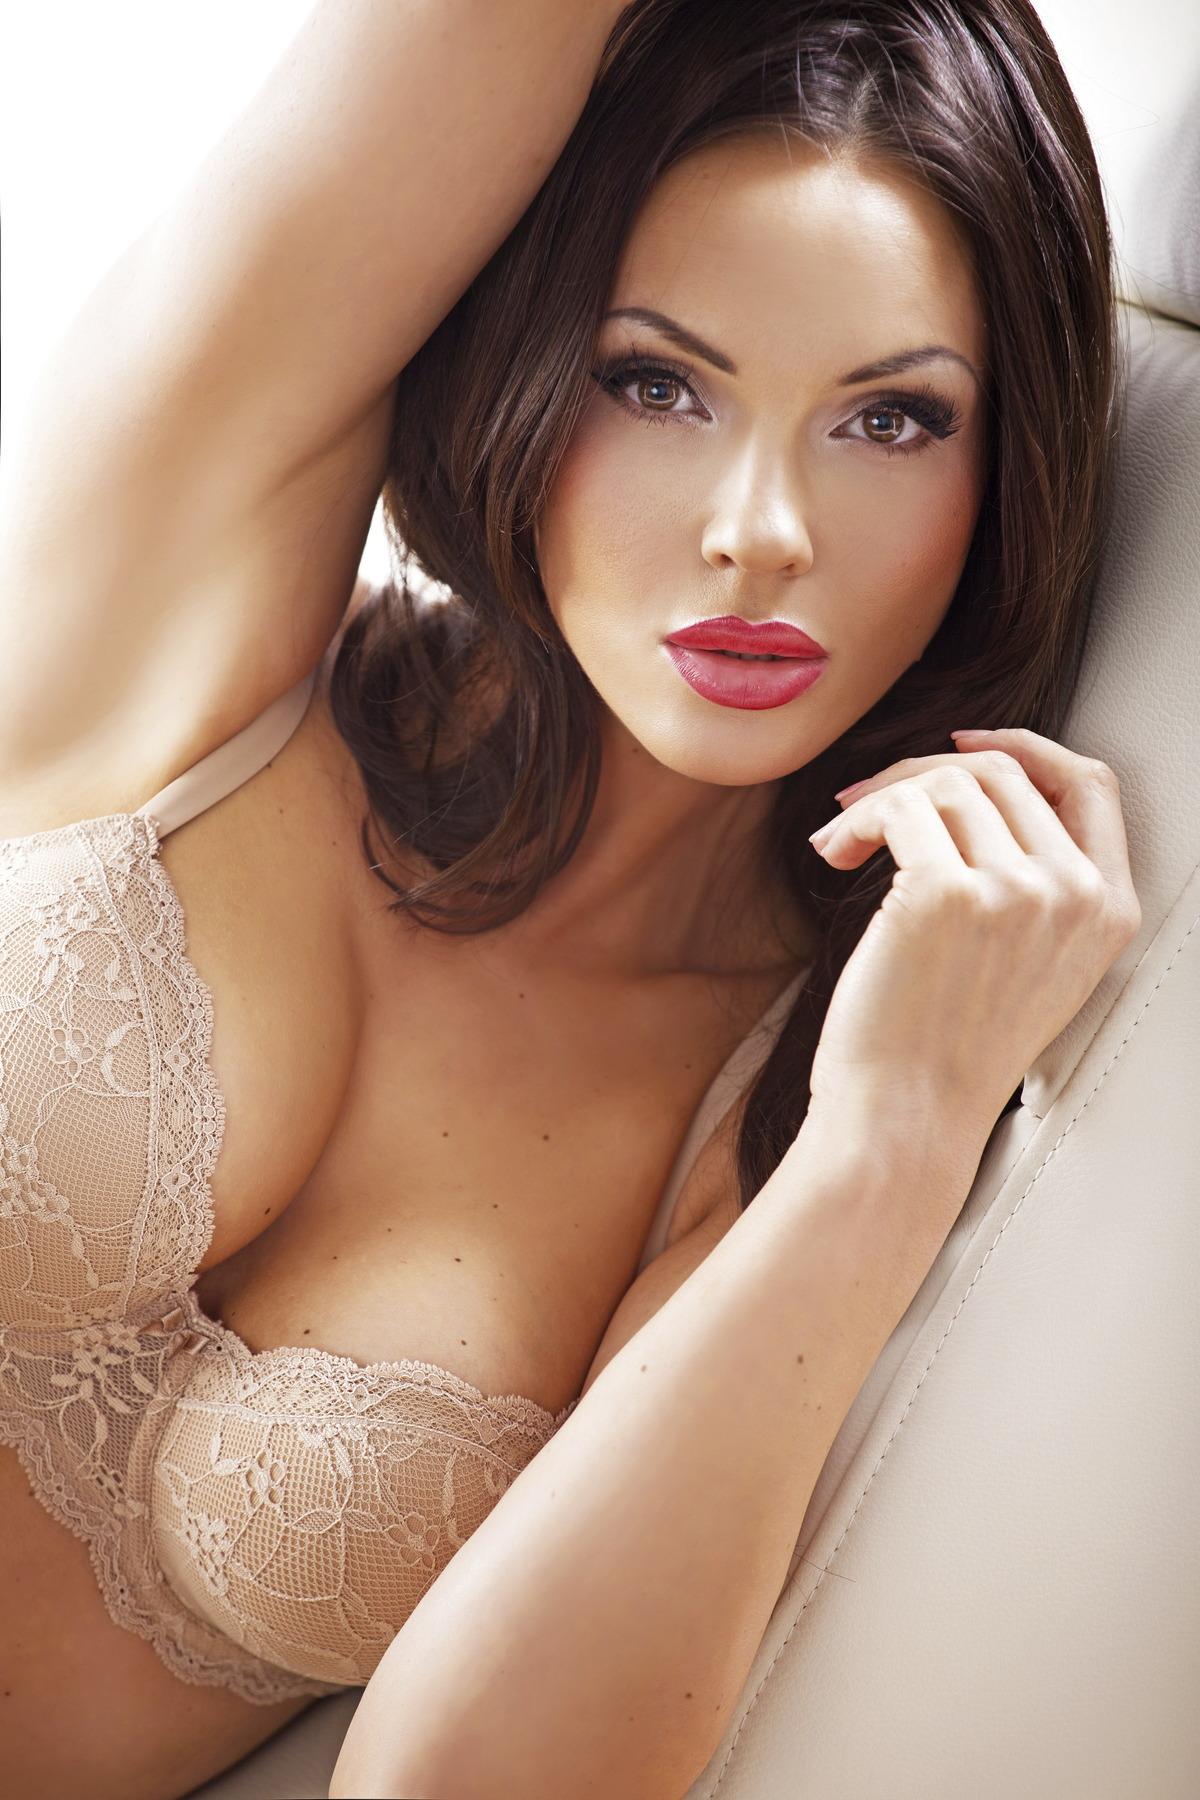 Sexy Girl mit krassem Blick